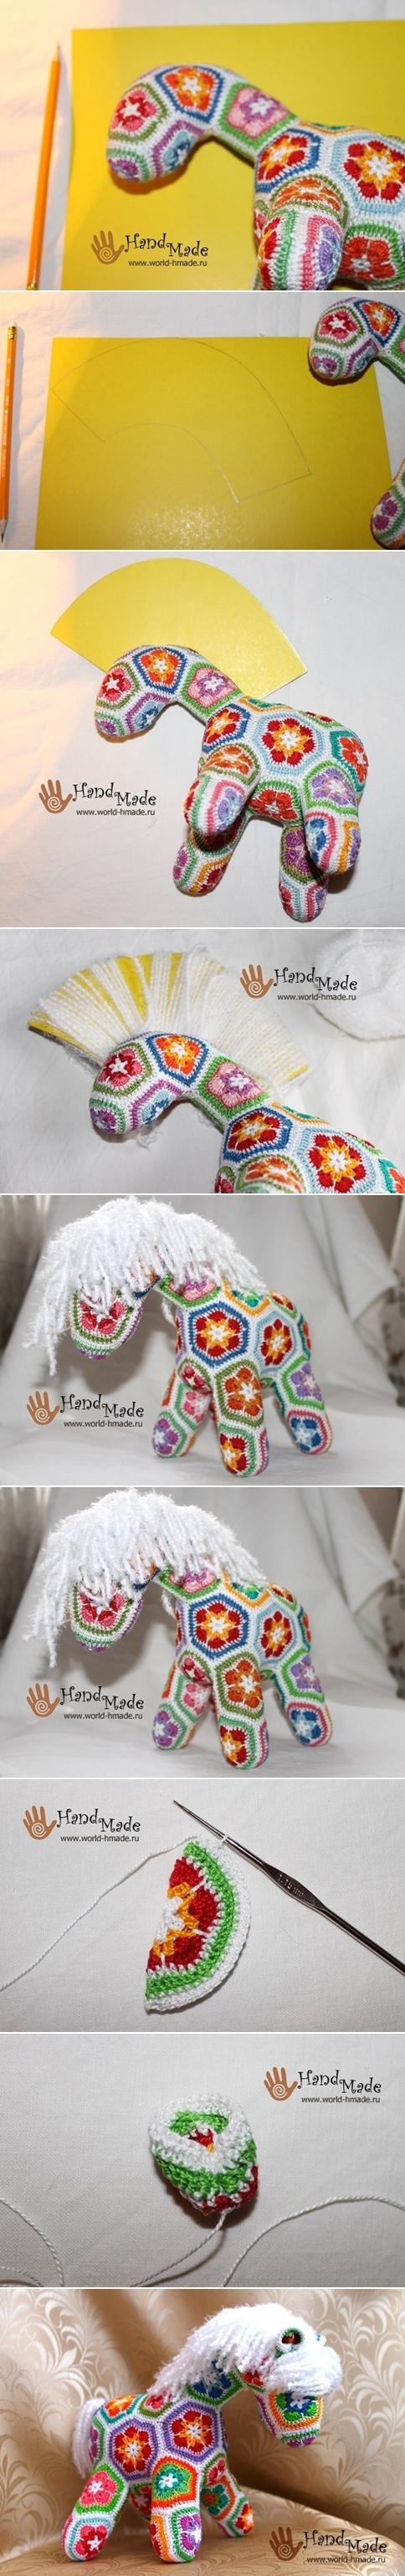 Crochet African Flower Horse Pattern : Crochet ?Afrain Flower? Horse DIY www.FabricArtDIY.com ...